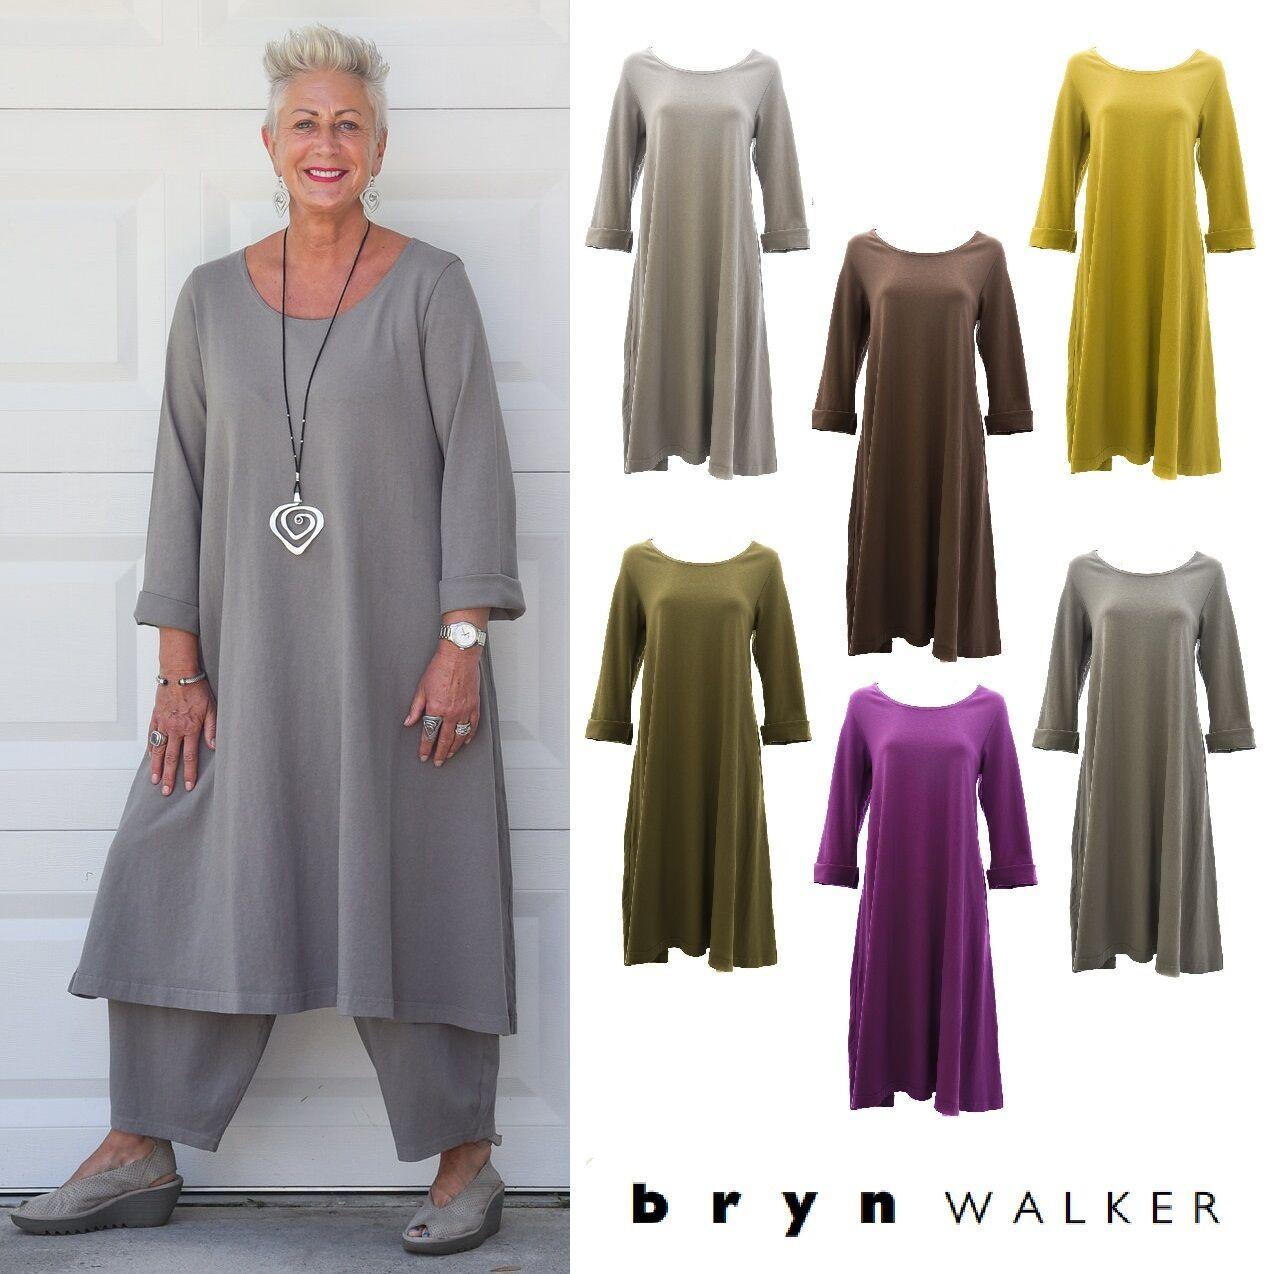 PACIFICOTTON Bryn Walker Pacific Cotton  LINUS DRESS  A-Line S M L XL  FALL 2017